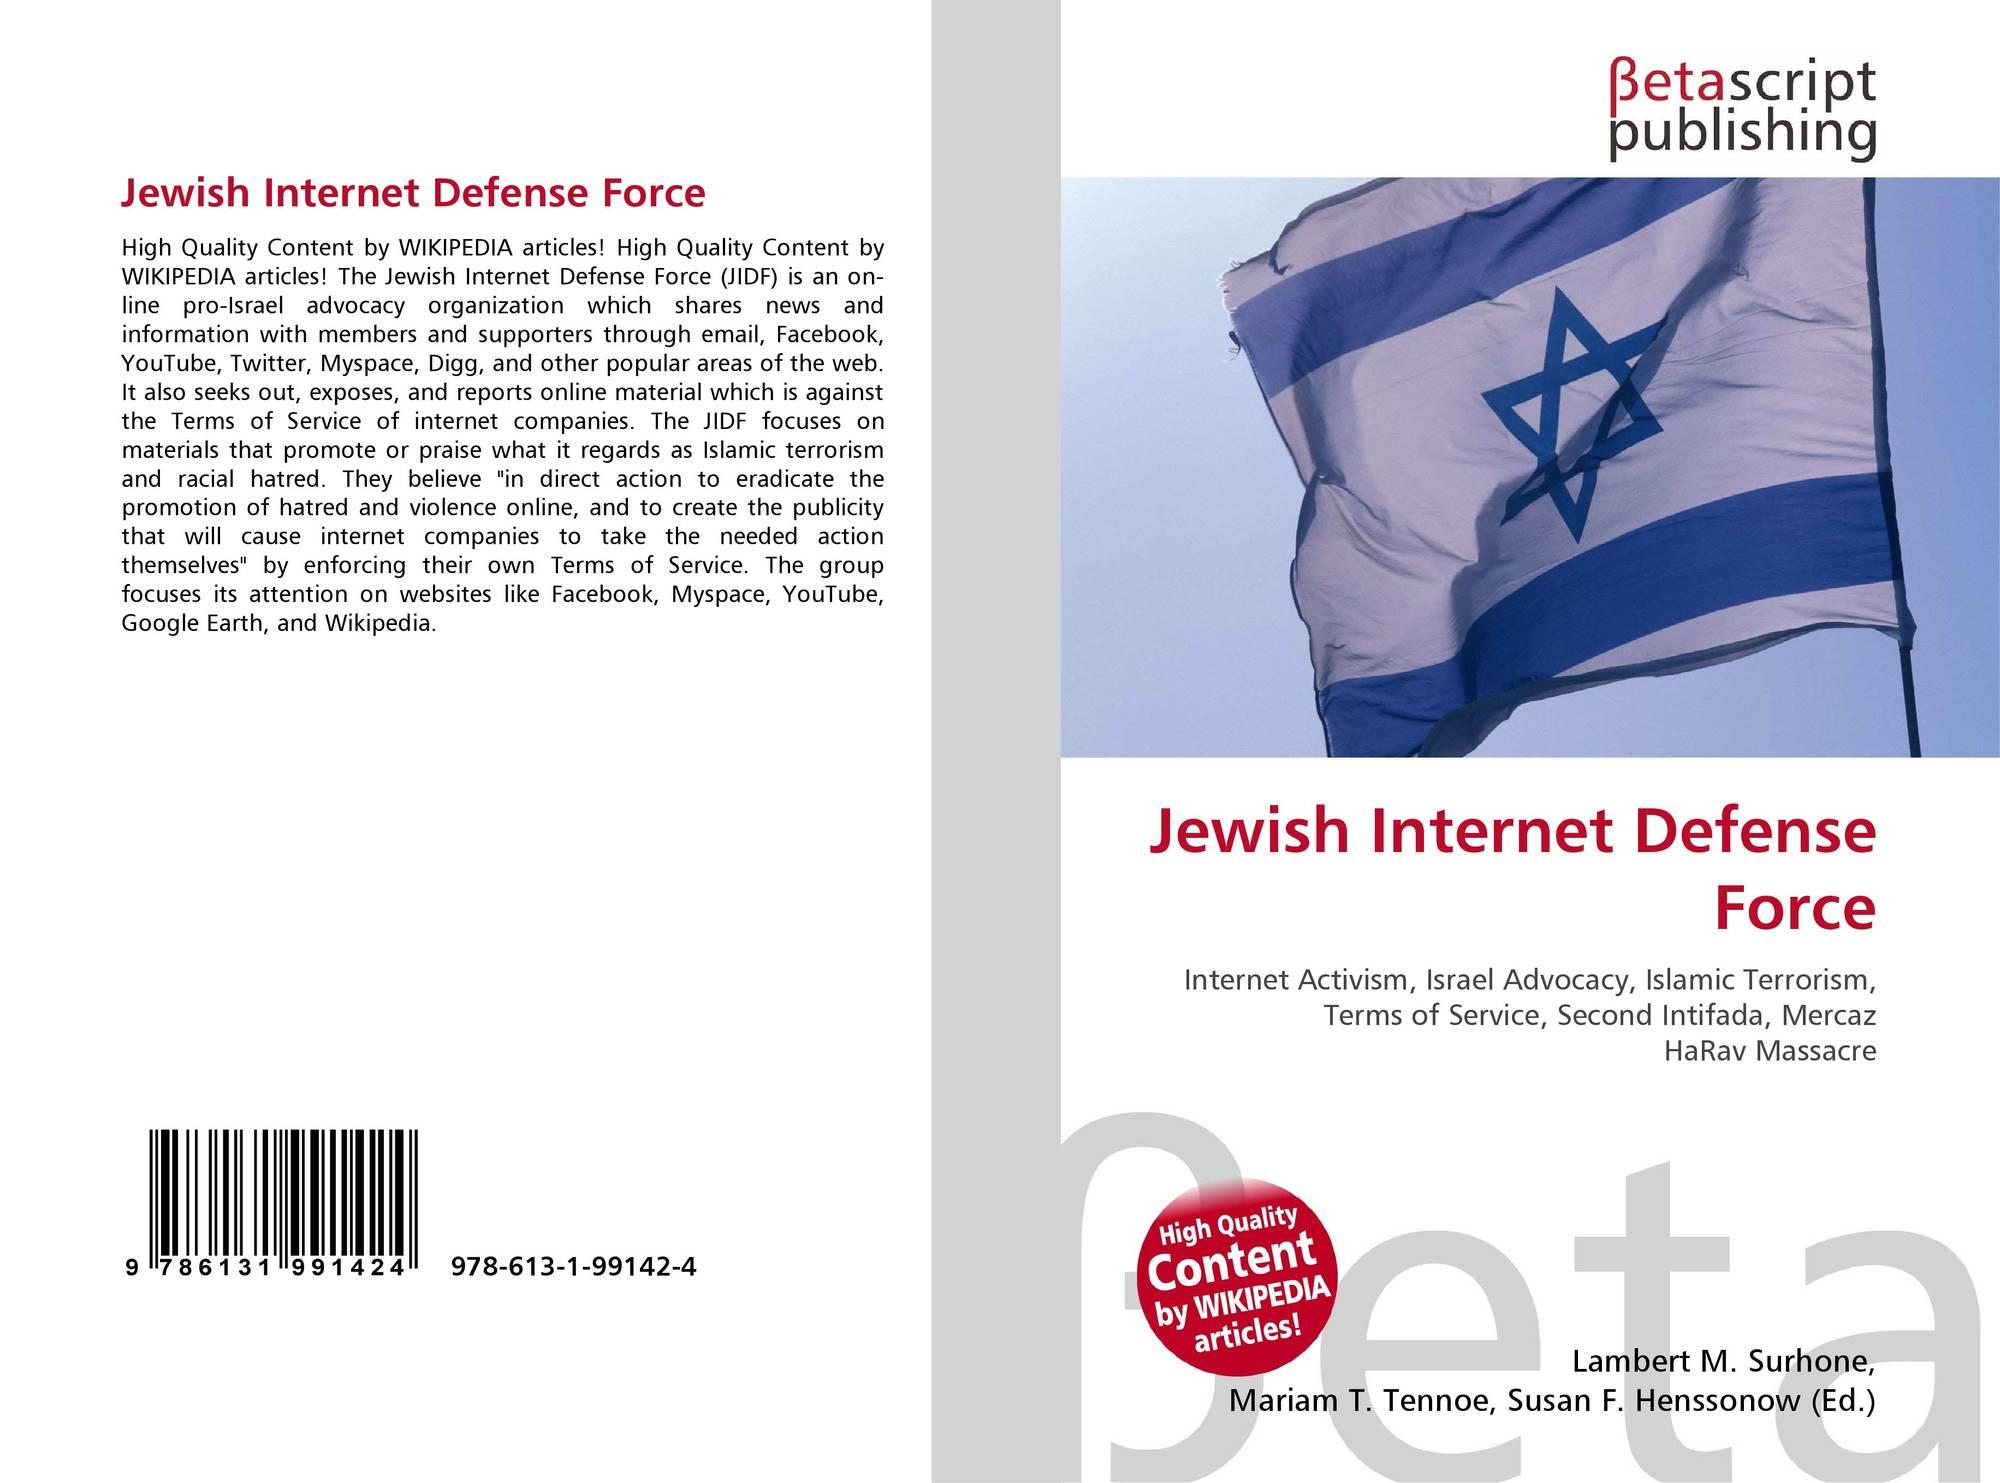 Jewish Internet Defense Force, 978-613-1-99142-4, 6131991421 ...